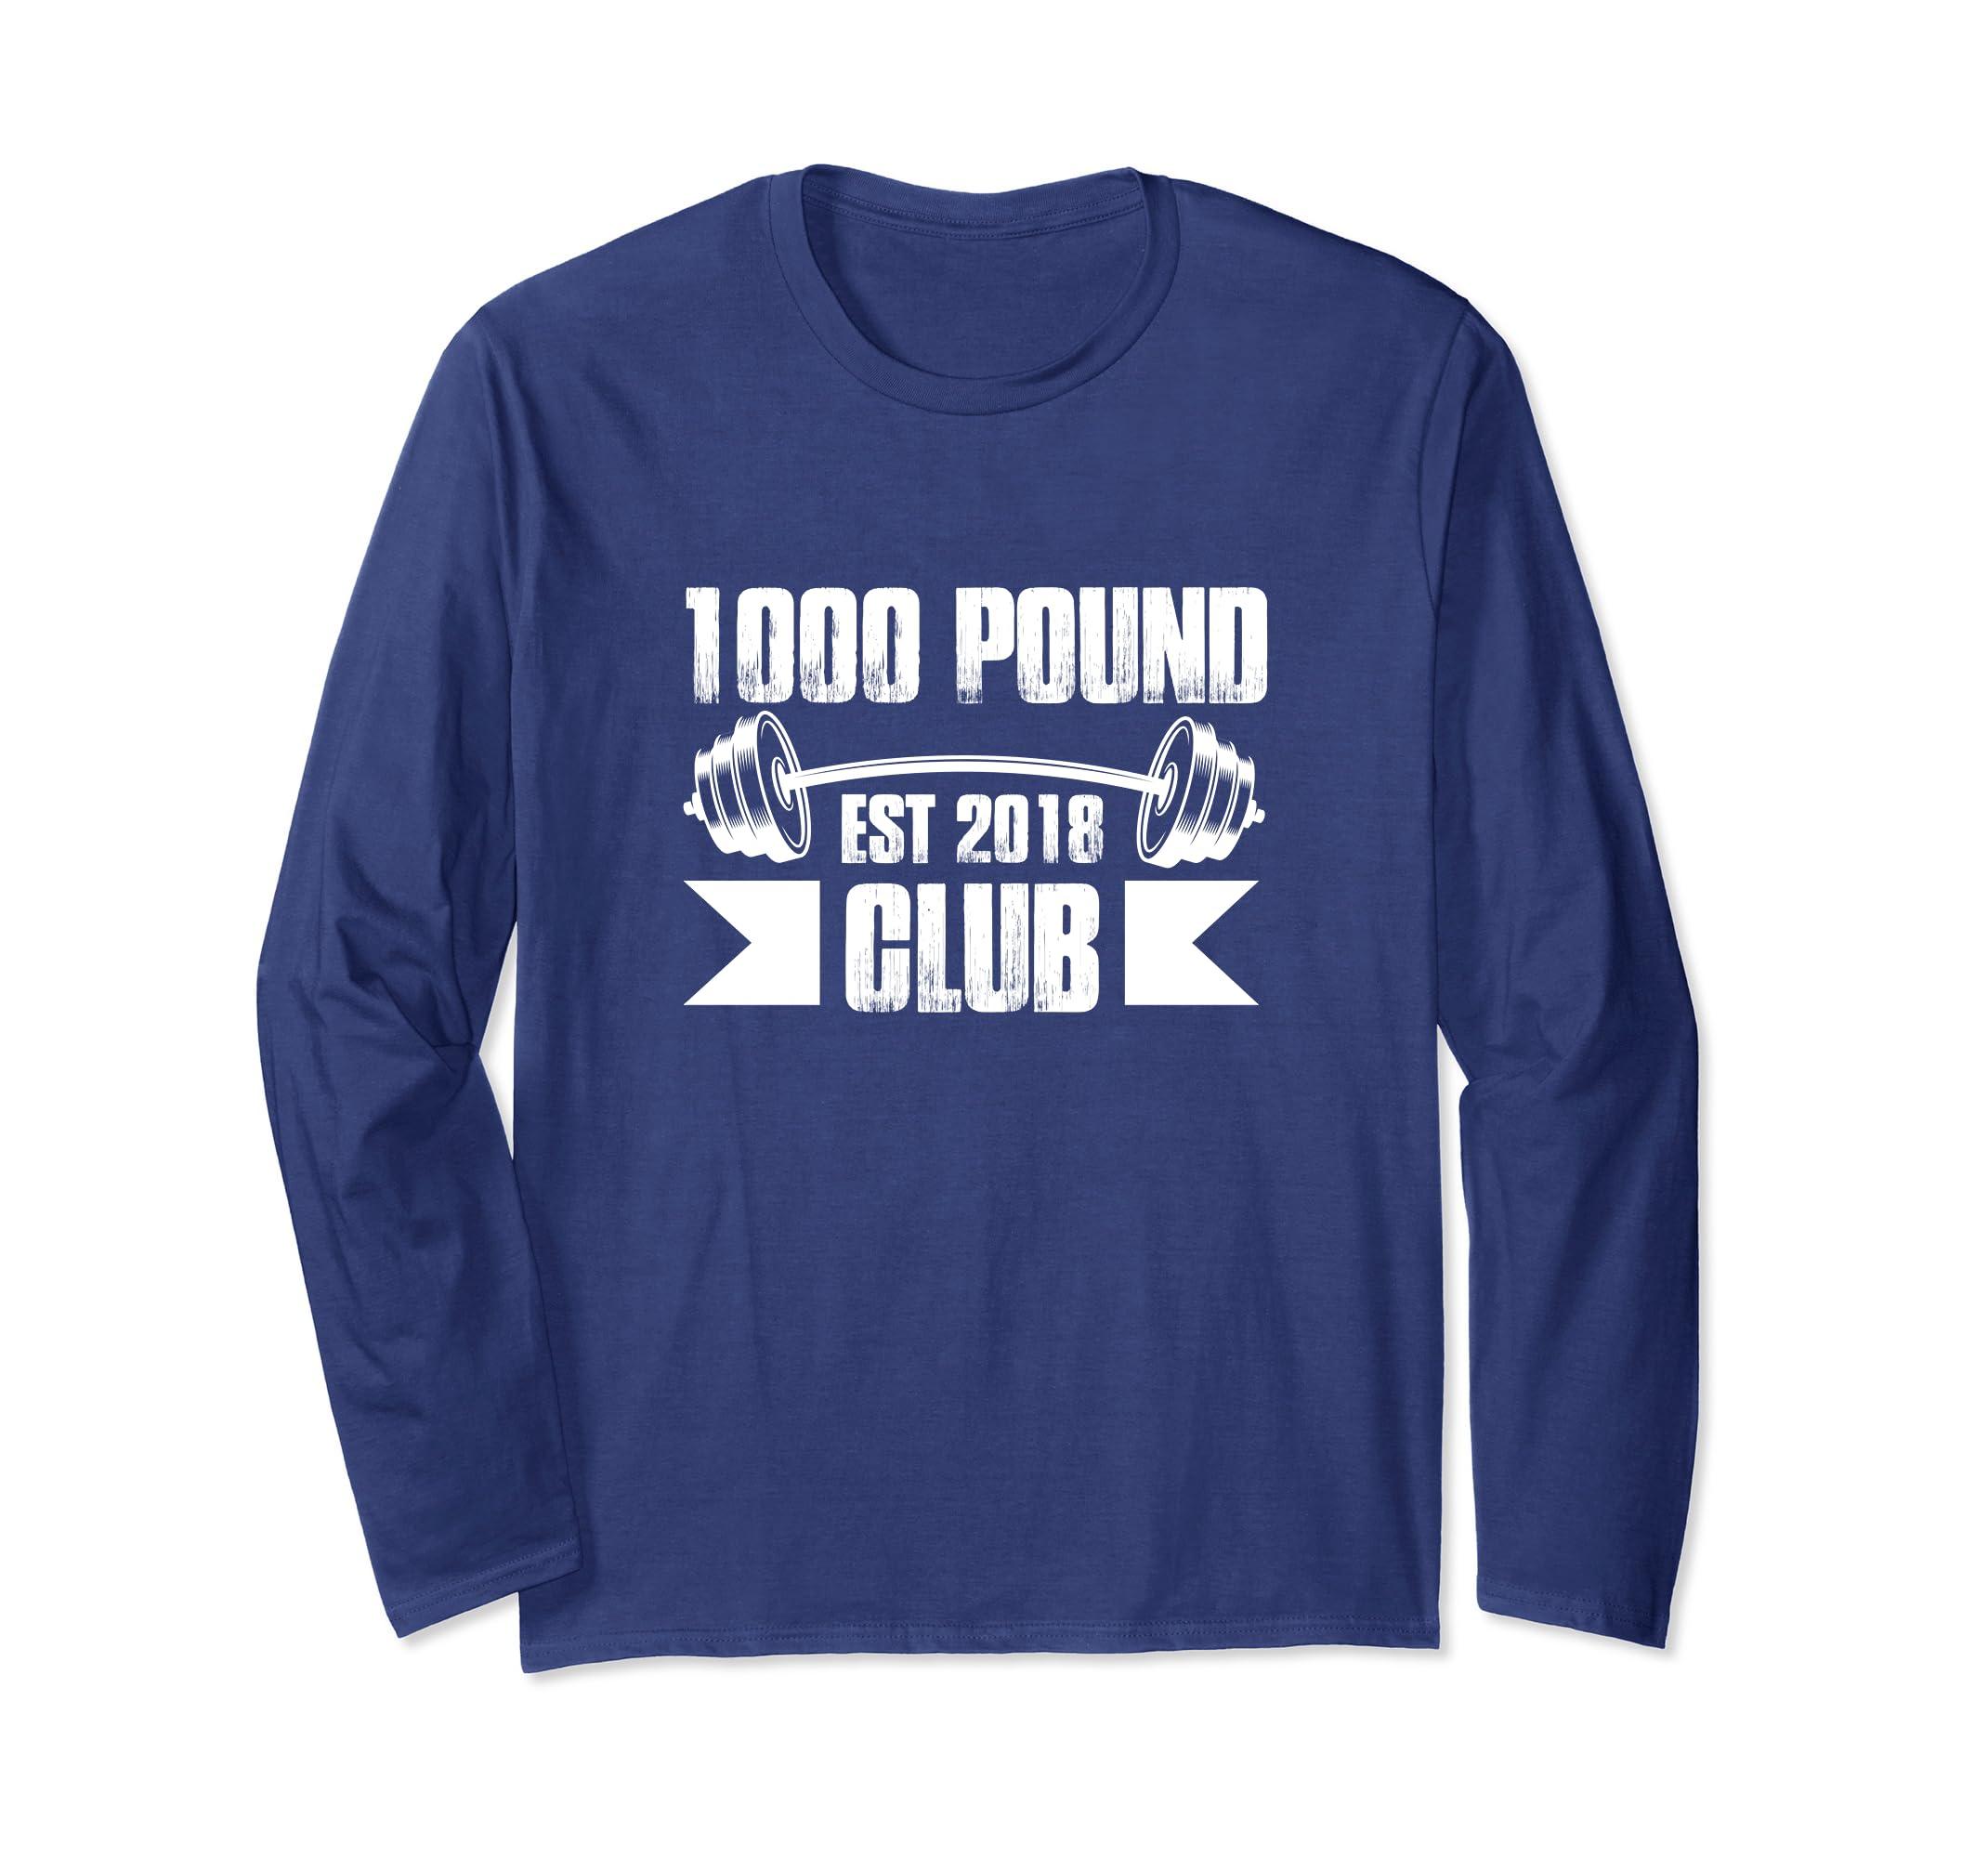 1000 Pound Club Member Long Sleeve T Shirt